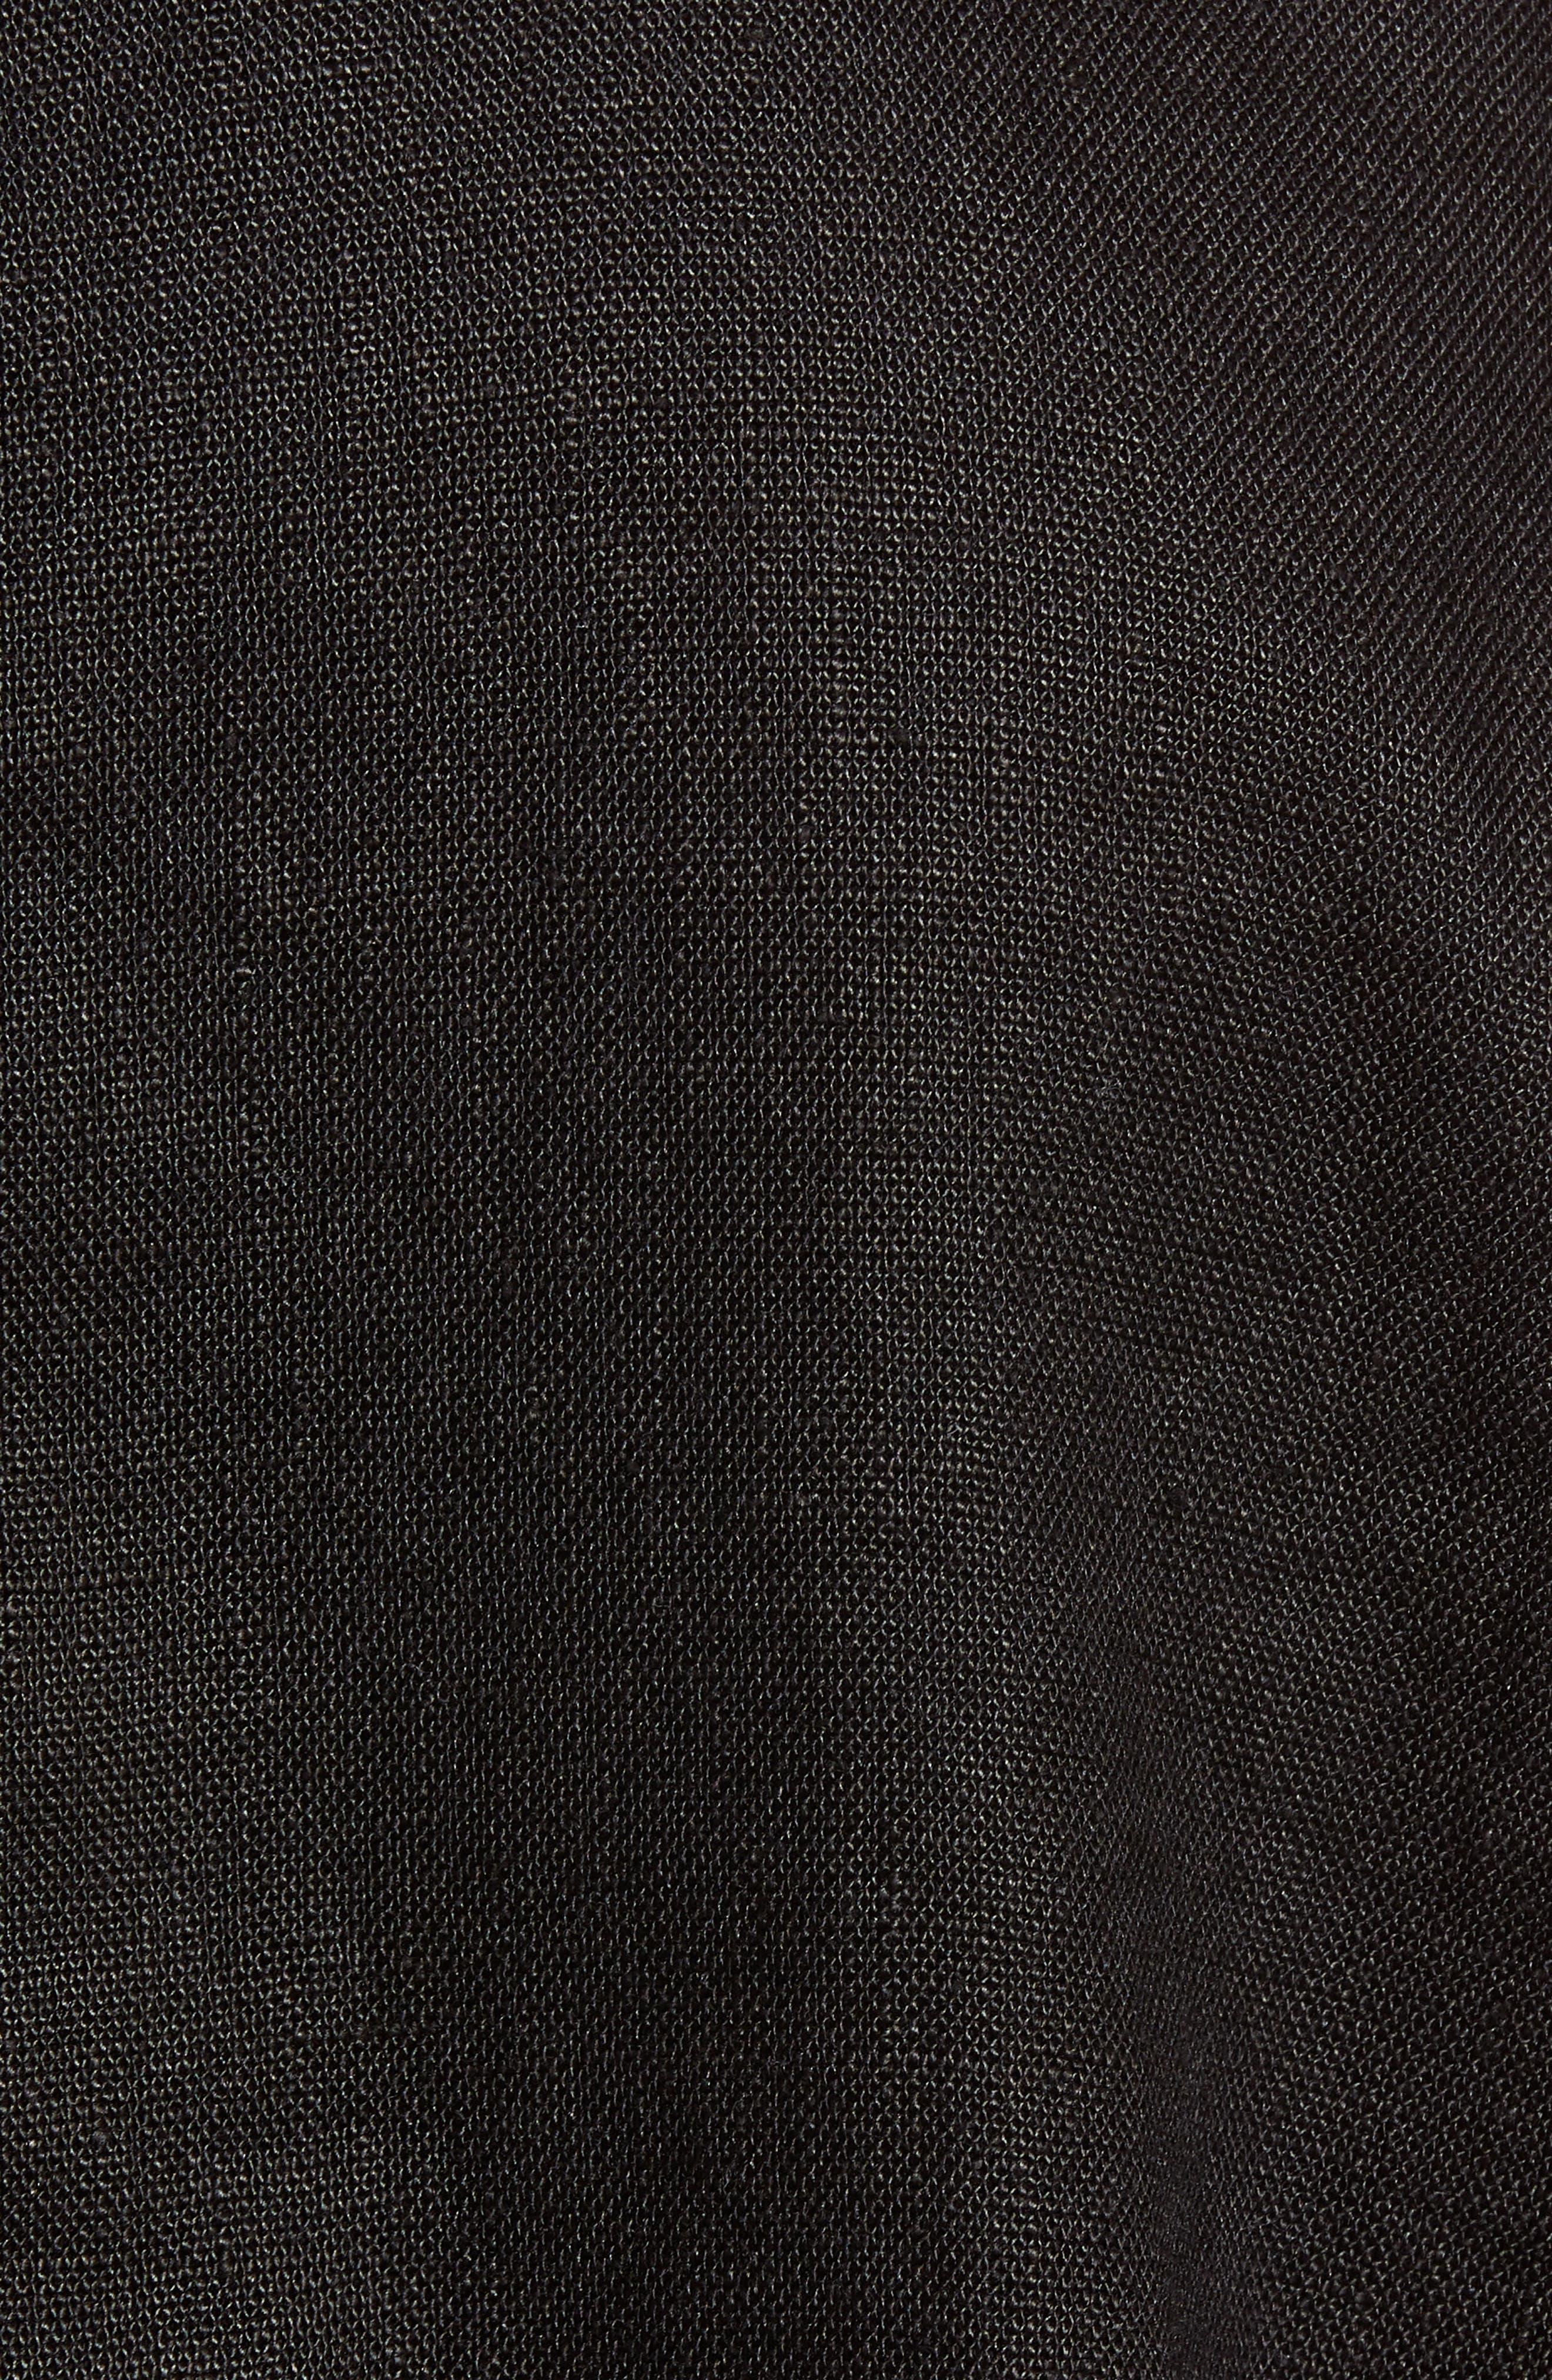 EILEEN FISHER,                             Drawstring Organic Linen Jacket,                             Alternate thumbnail 7, color,                             001